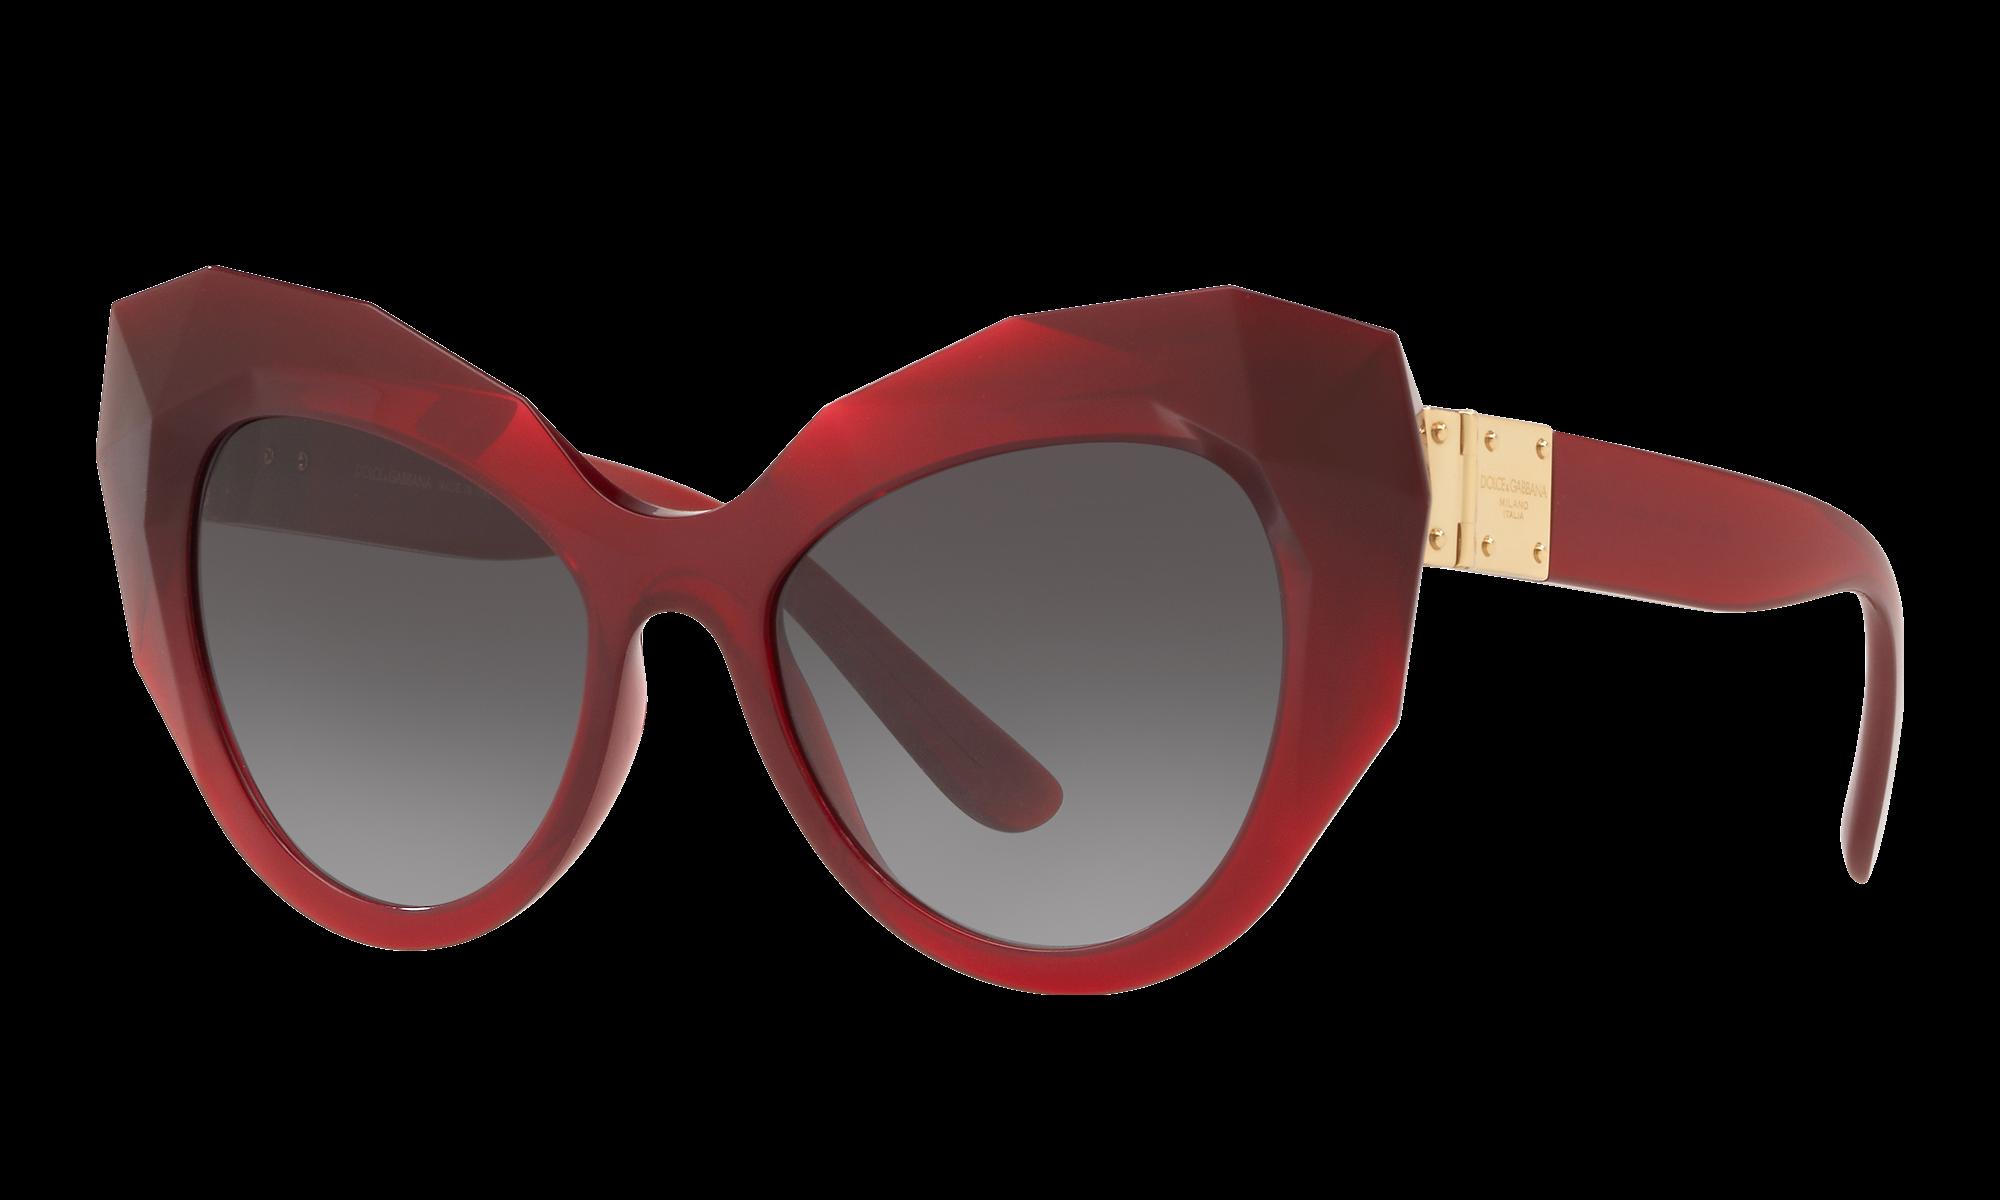 Dolce & Gabbana DG6122 | Glasses.com® | Free Shipping